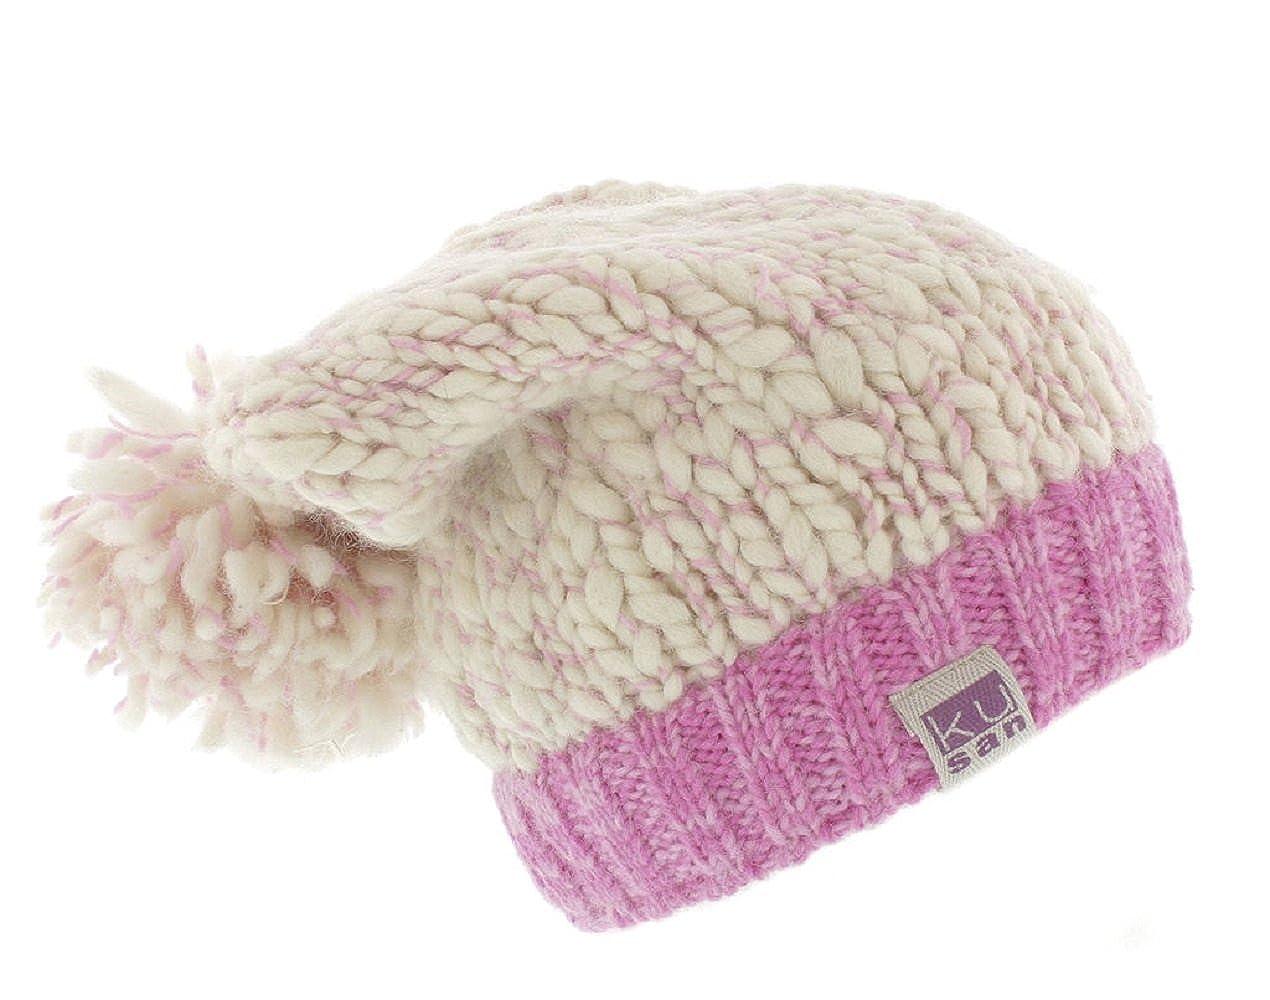 bf5138ad1 Kusan (KU1202 100% Wool Floppy Bobble Beanie hat (Mens/Ladies/Unisex)